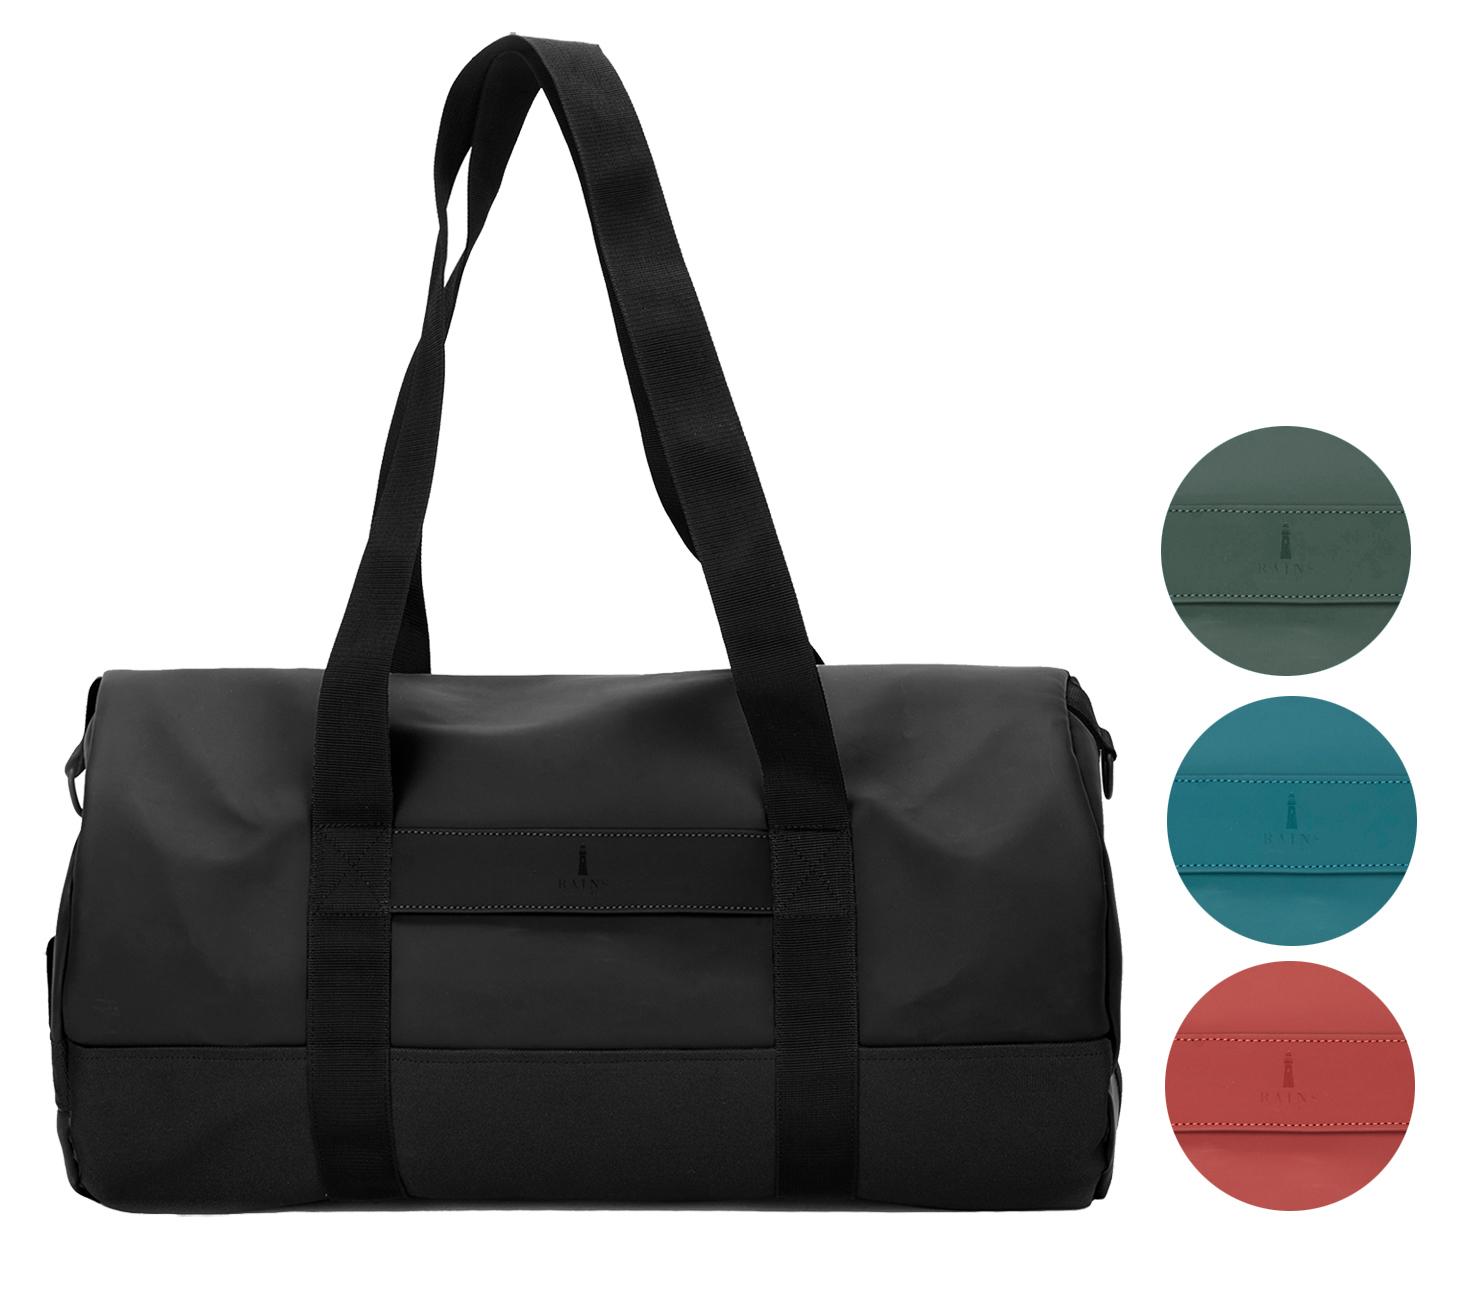 rains sporttasche duffel scandinavian lifestyle. Black Bedroom Furniture Sets. Home Design Ideas